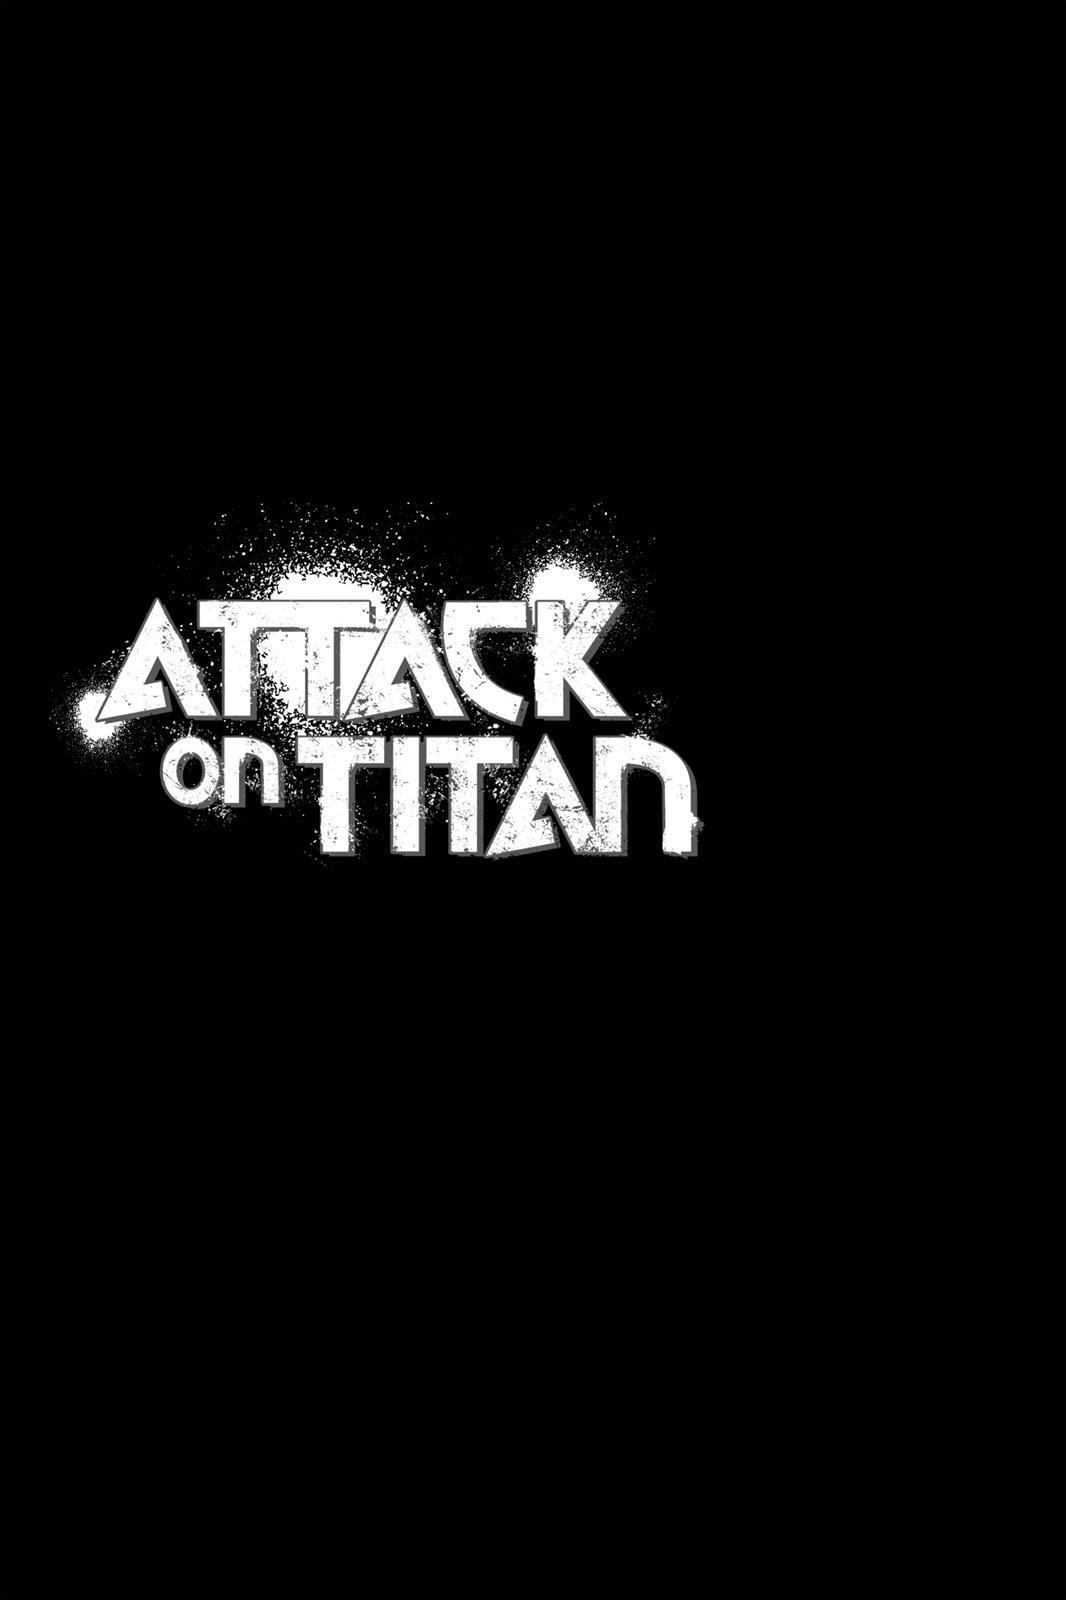 Attack On Titan, Episode 14 image 047